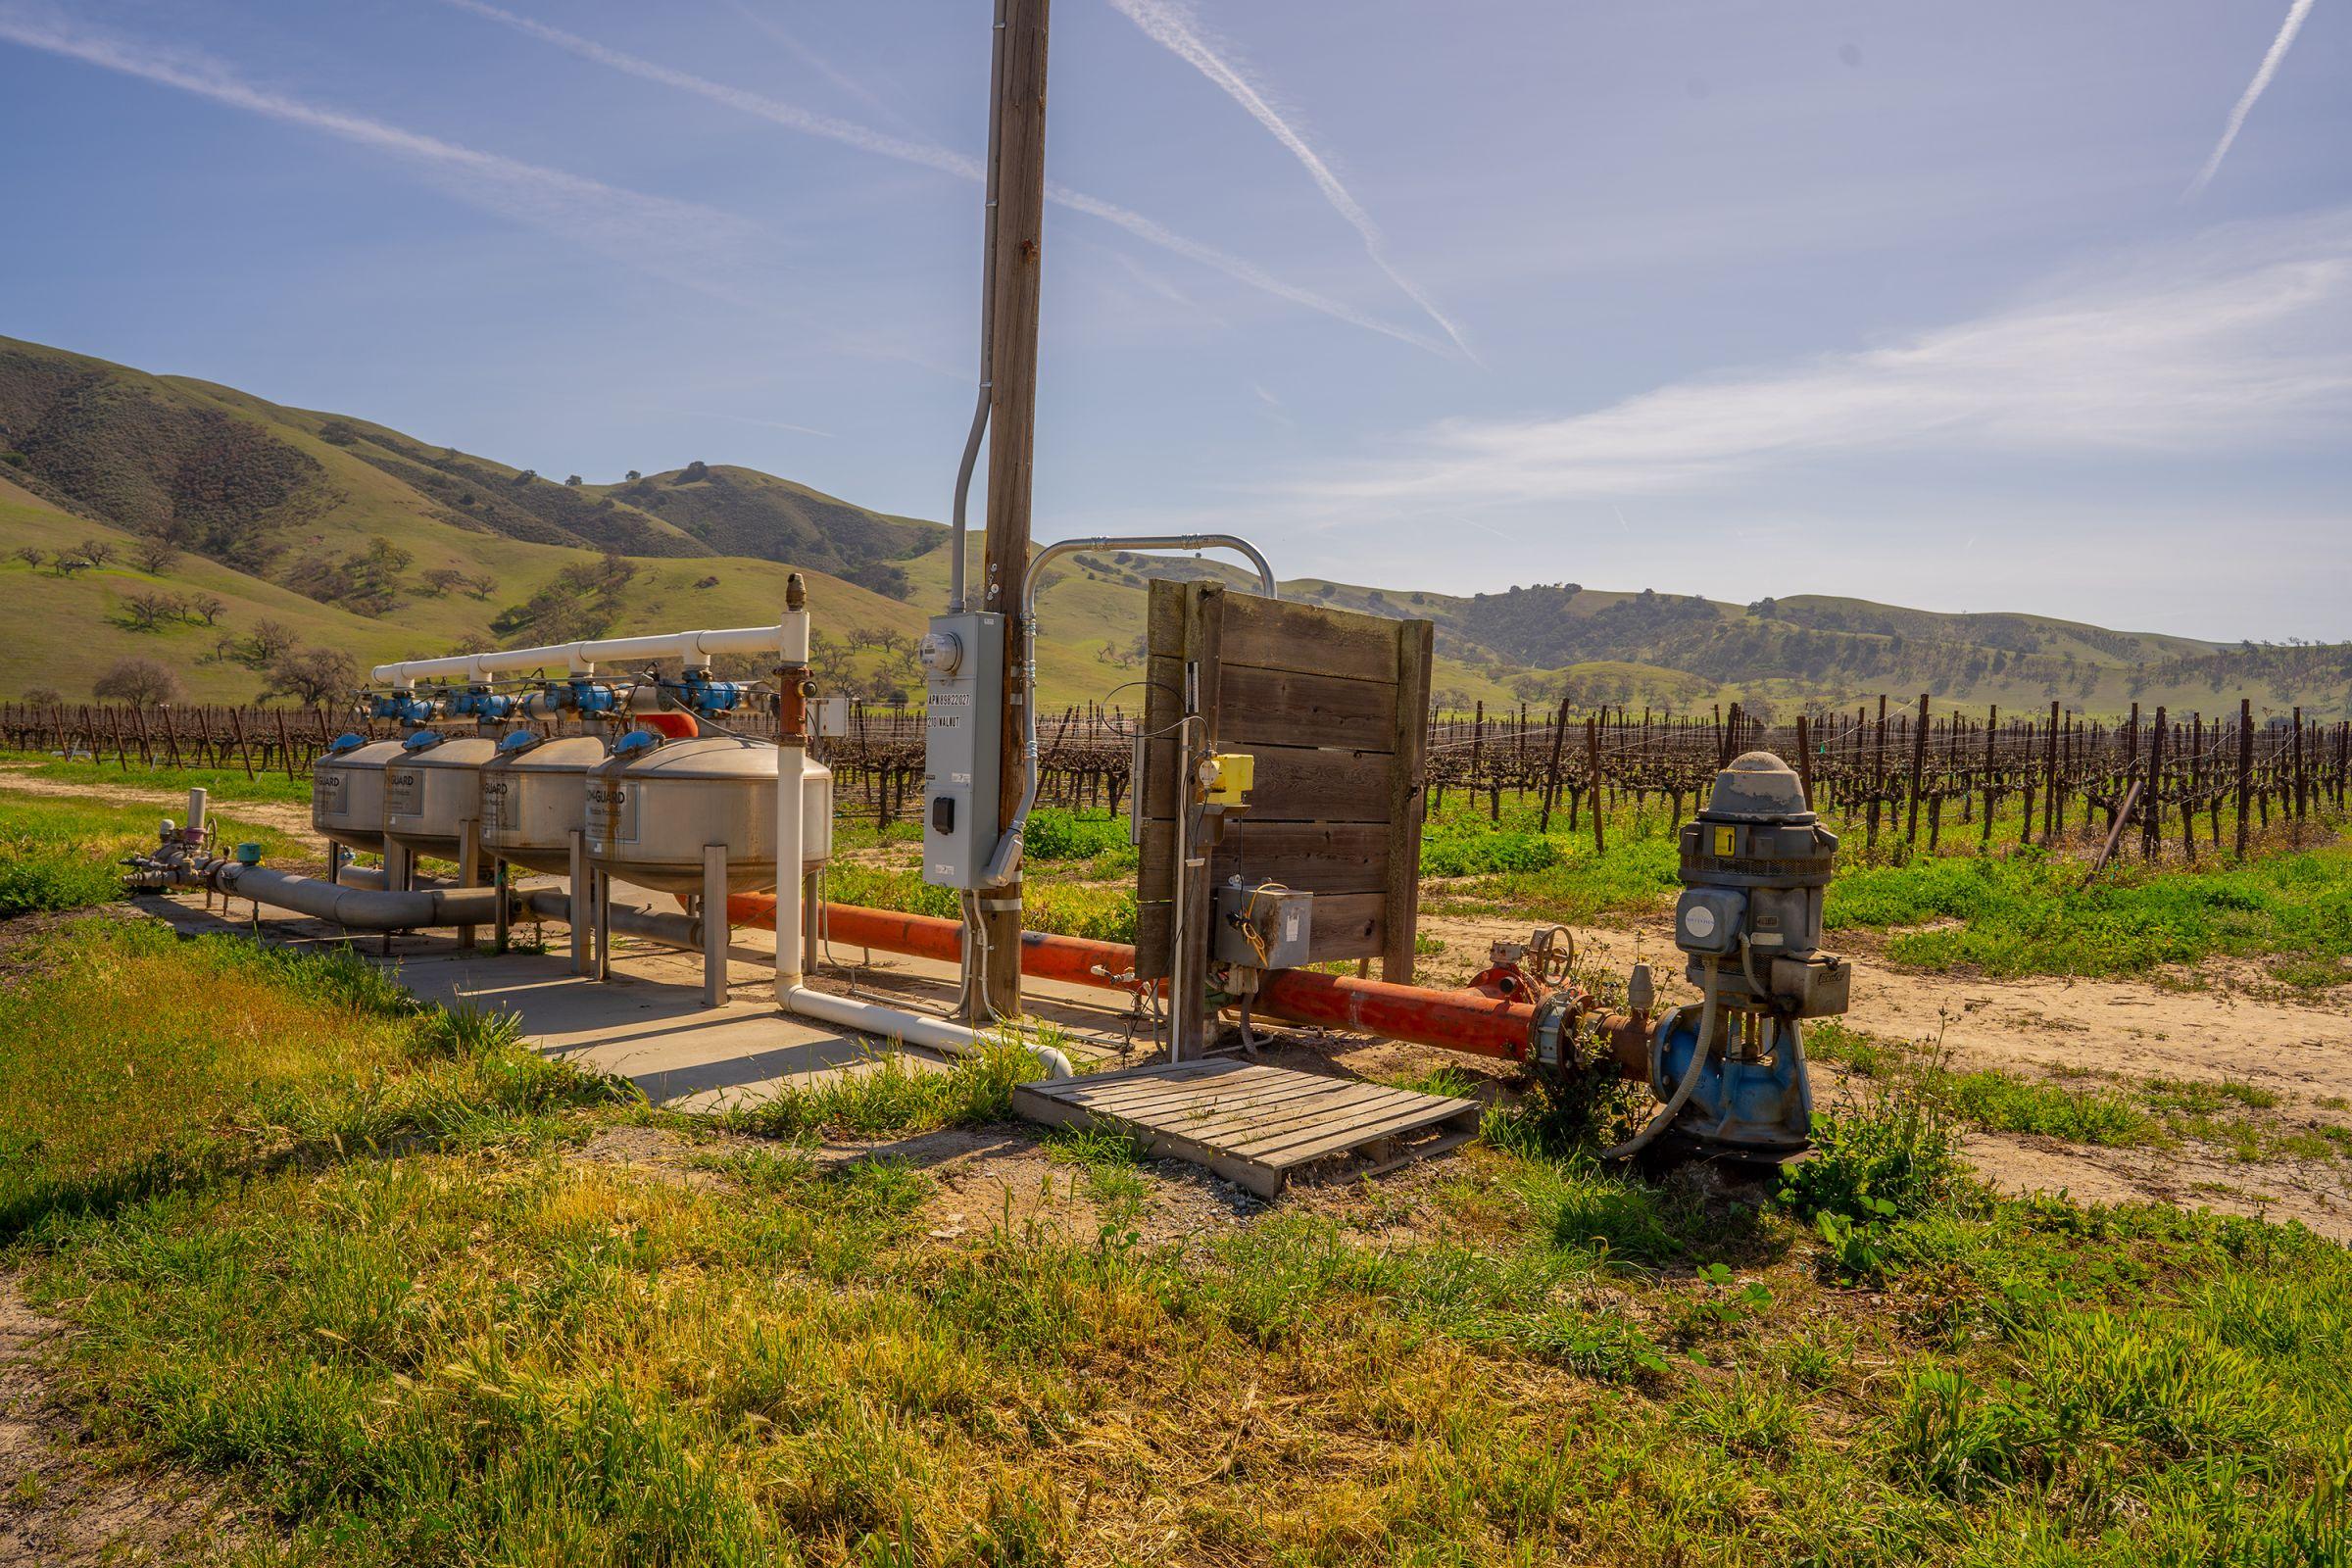 santa-clara-county-california-497-acres-listing-number-15435-4-2021-03-30-213029.jpg